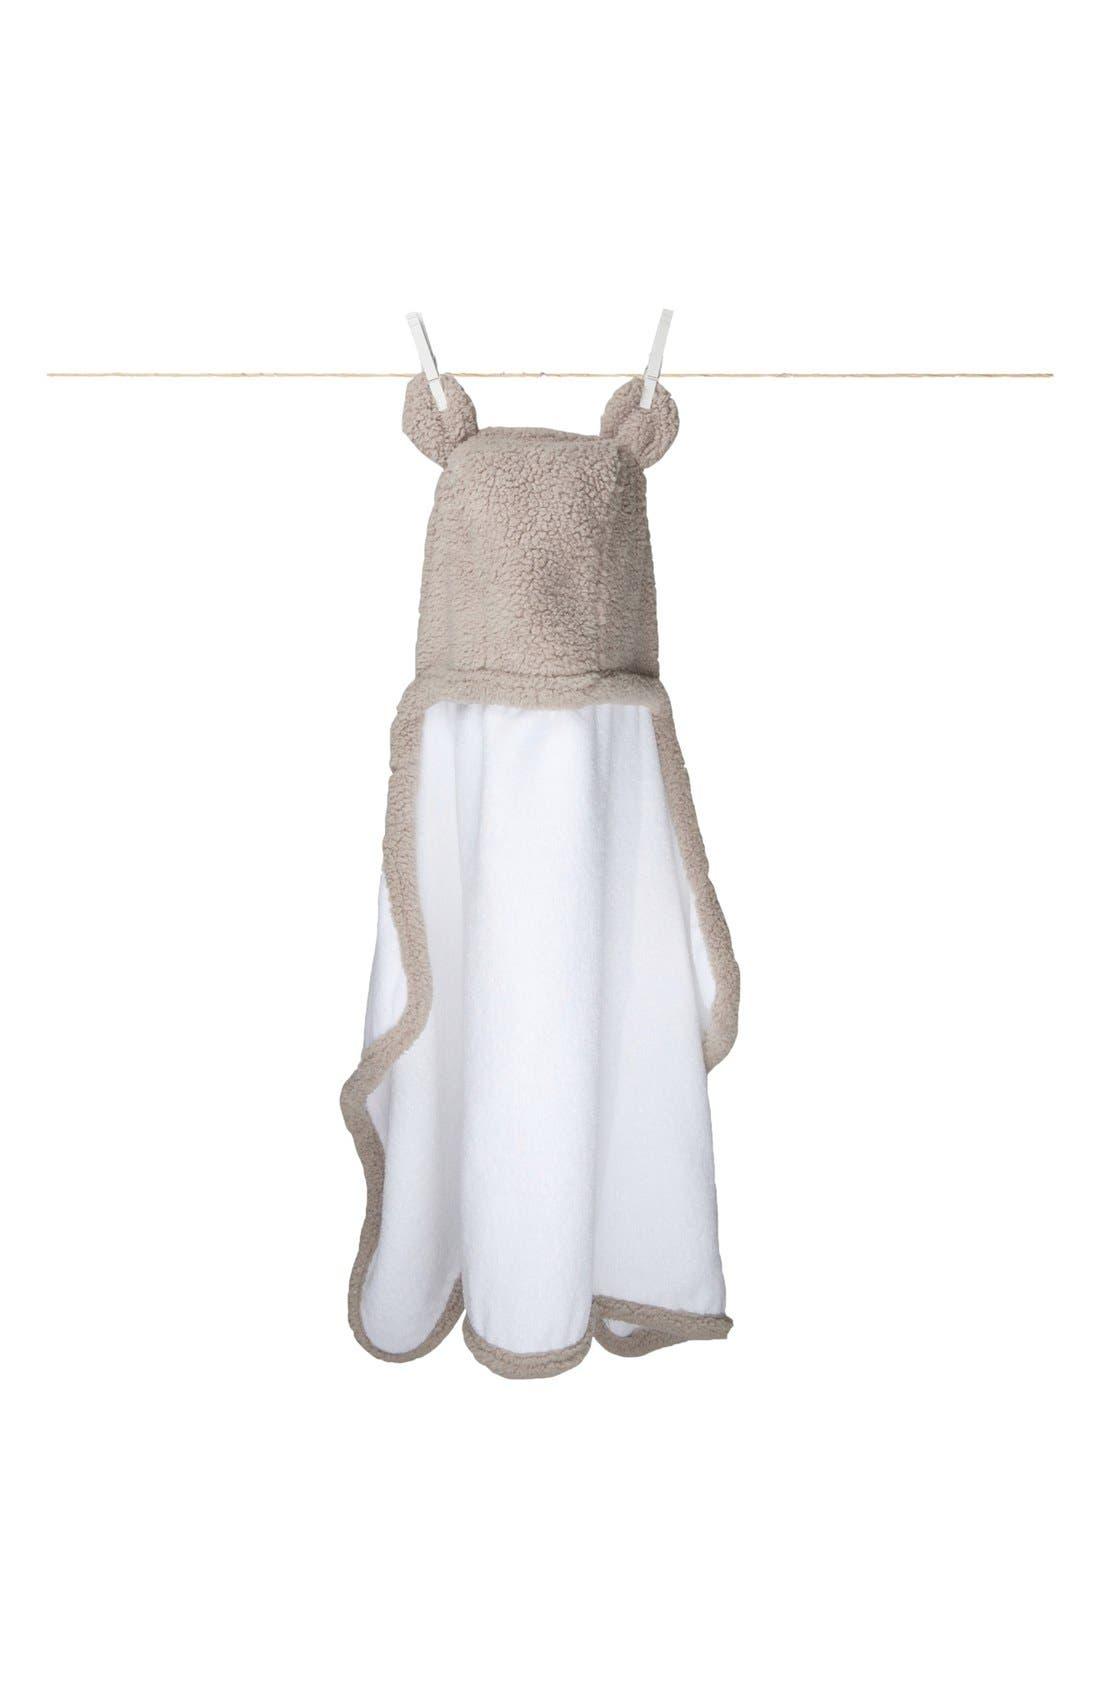 'Bella<sup>™</sup>' Towel,                         Main,                         color, Flax